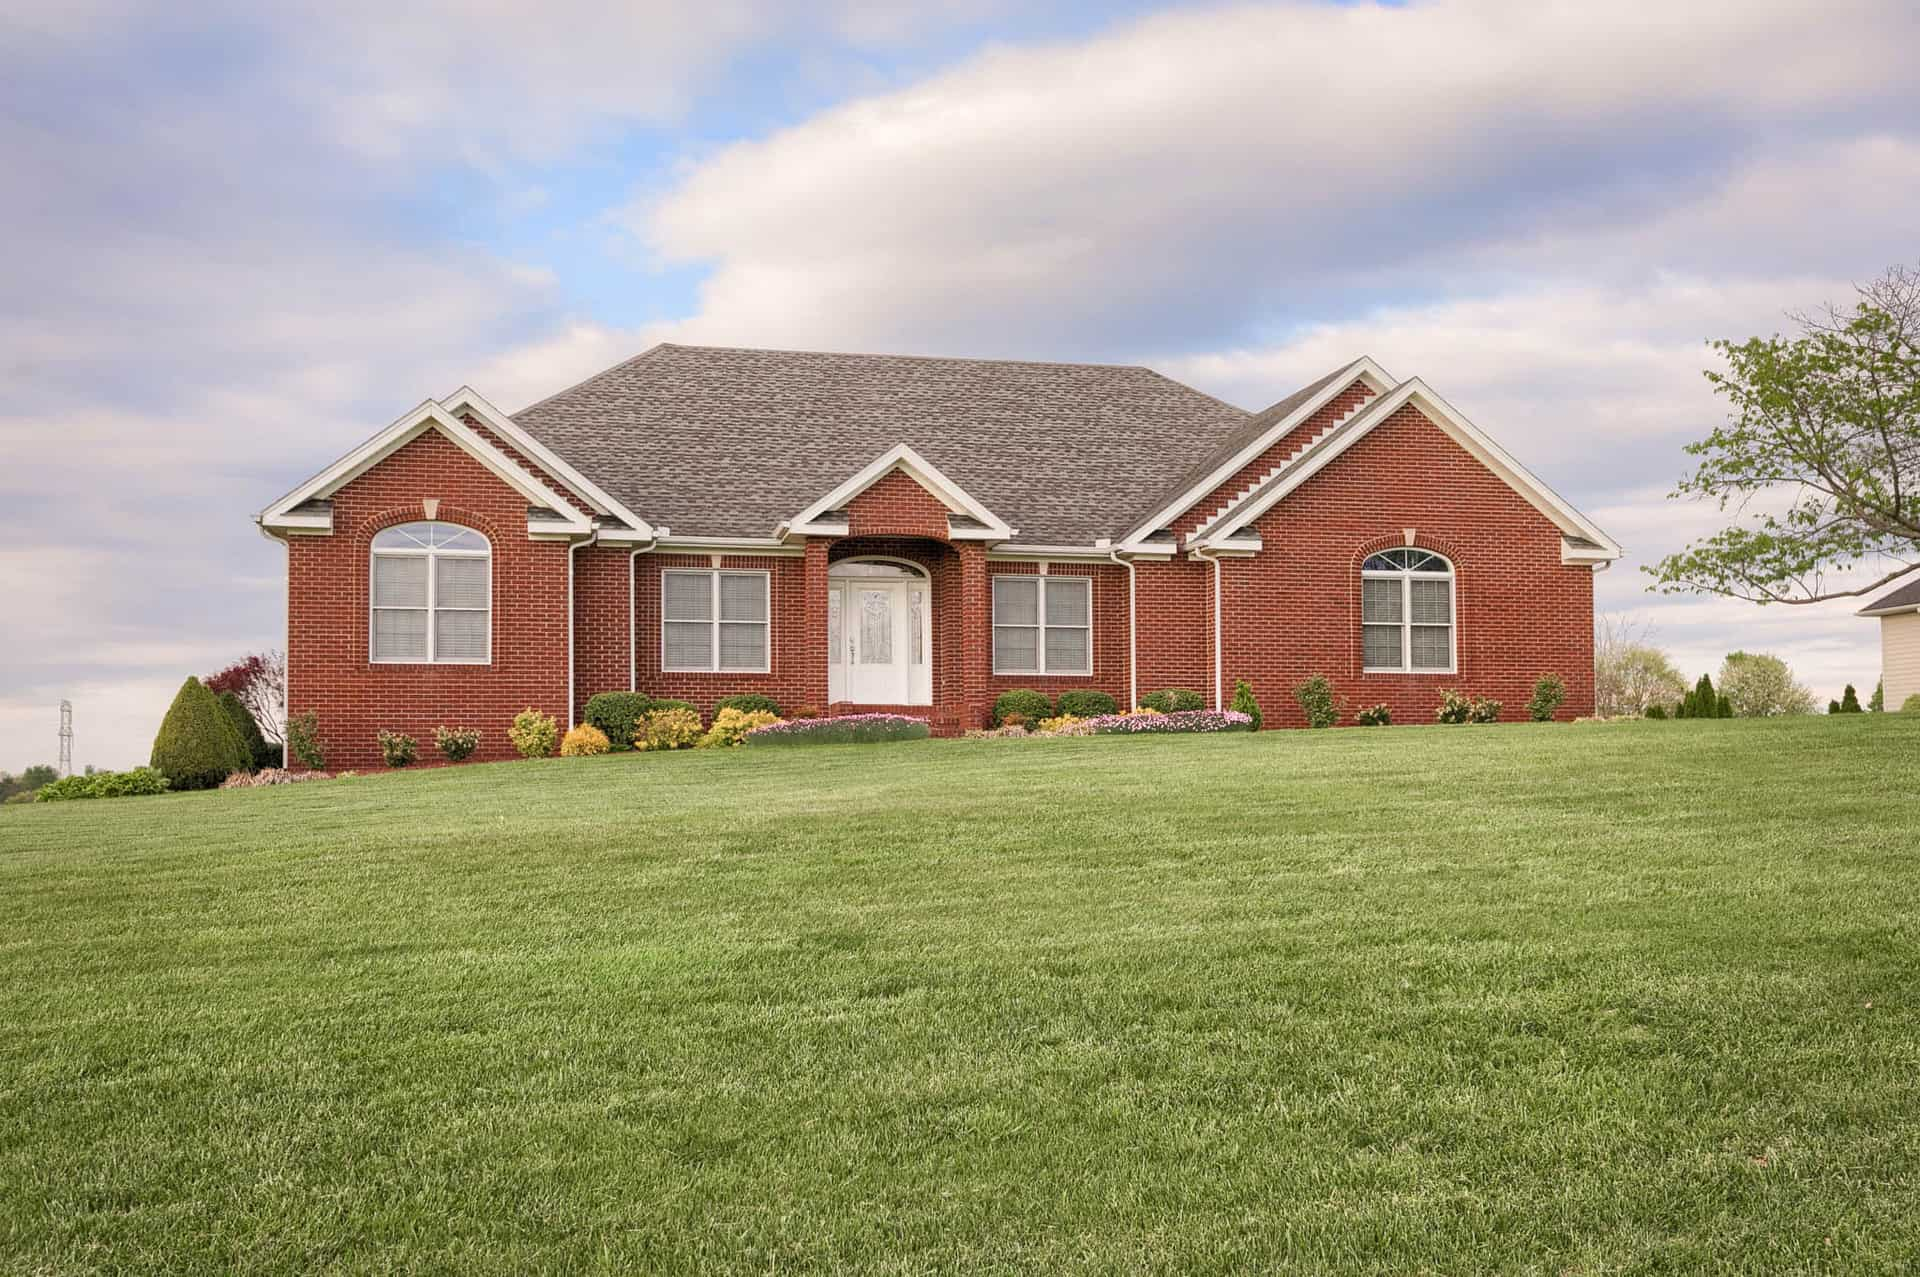 2625 Hayden Rd., Owensboro, KY 42303